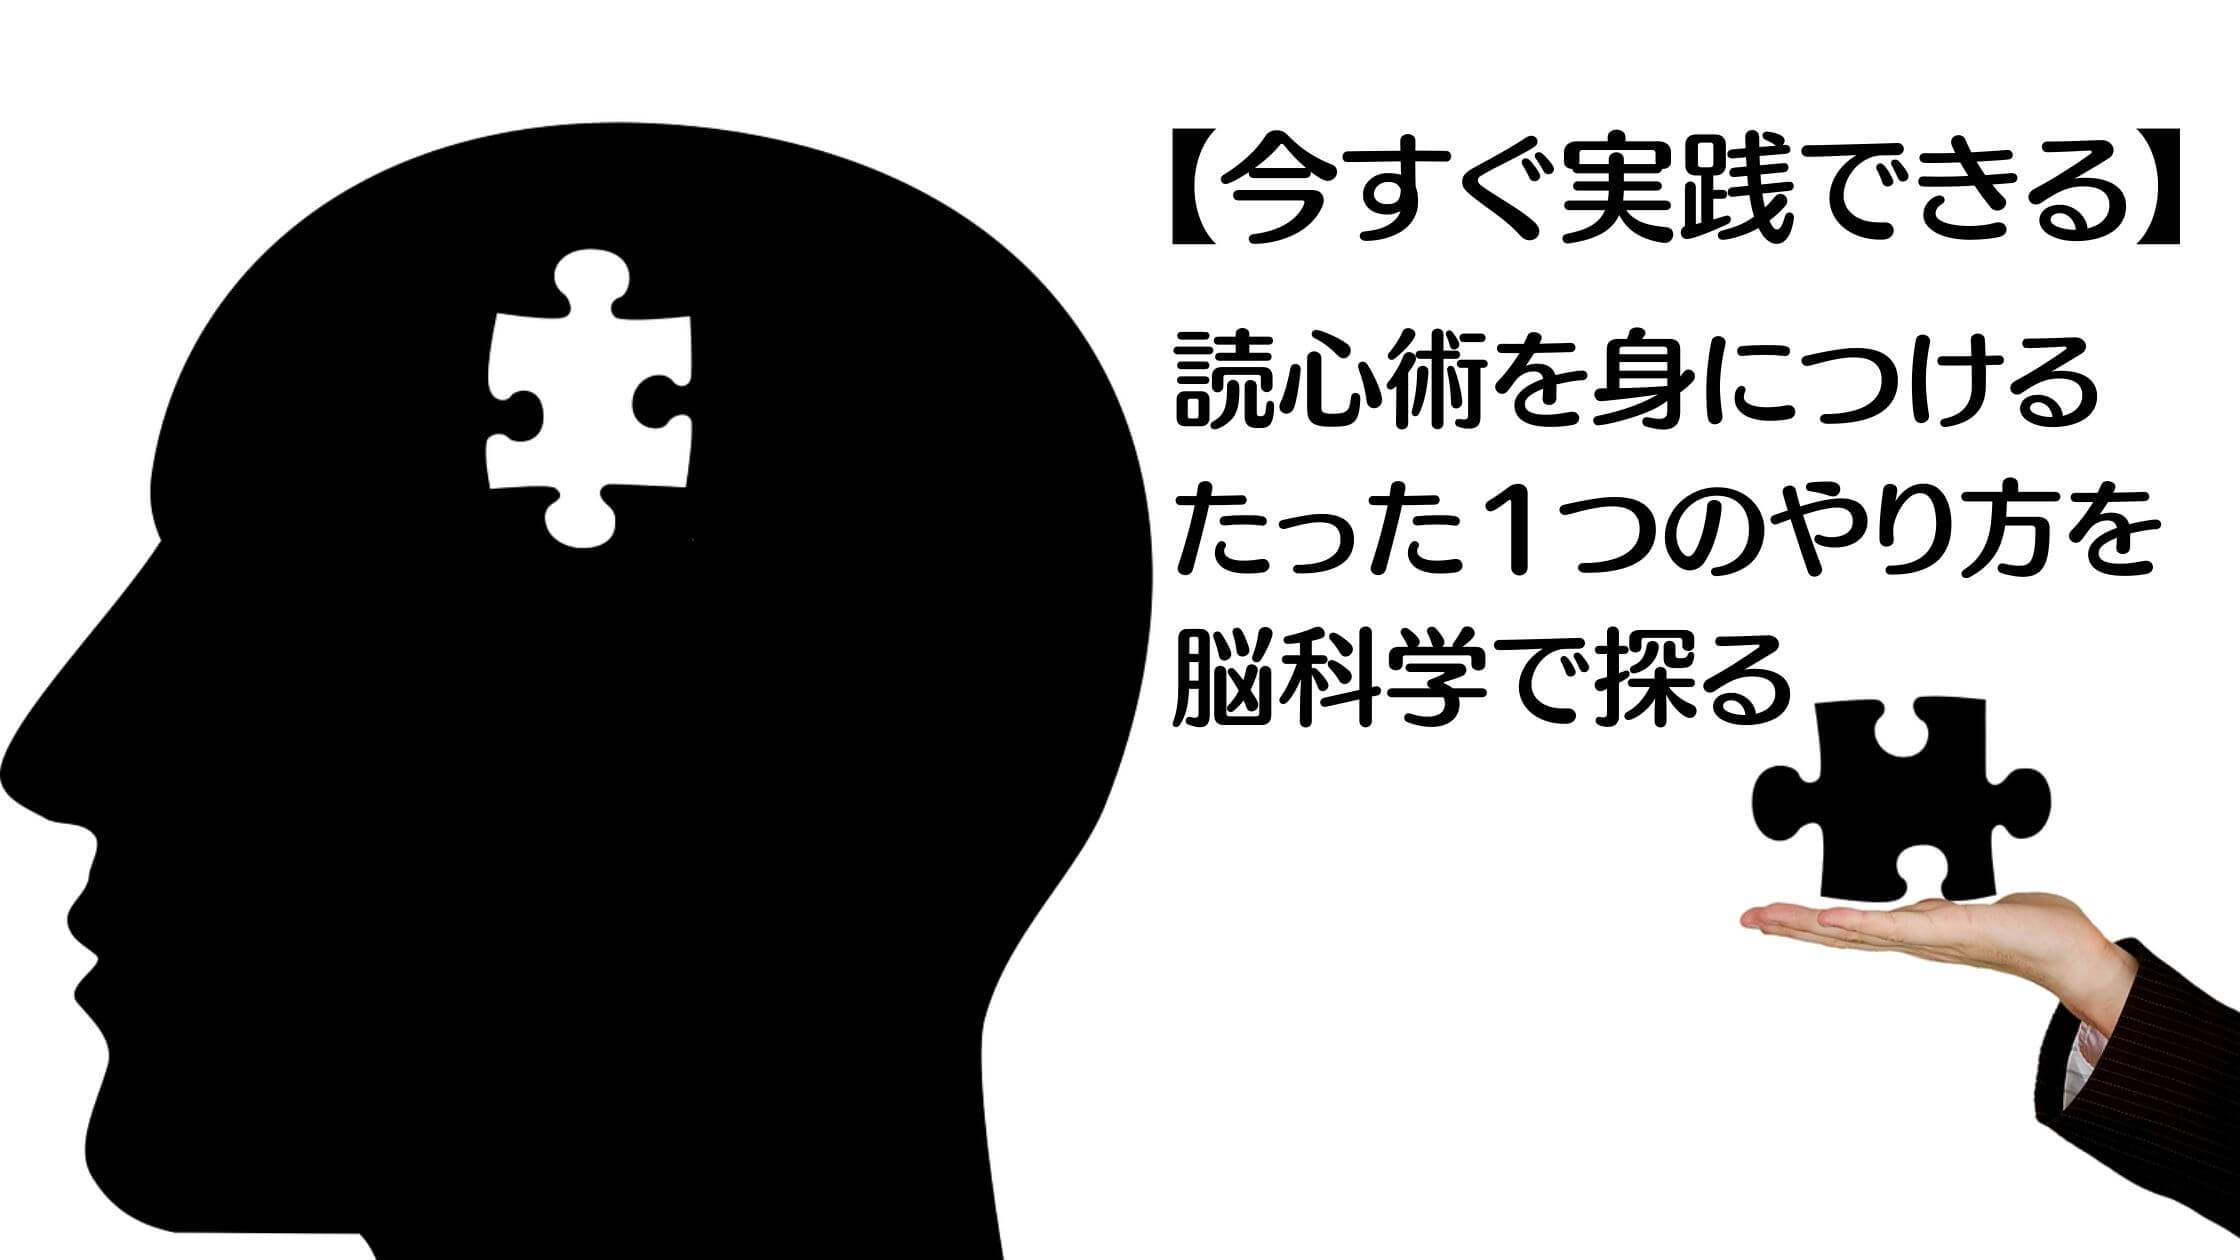 読心術-A1